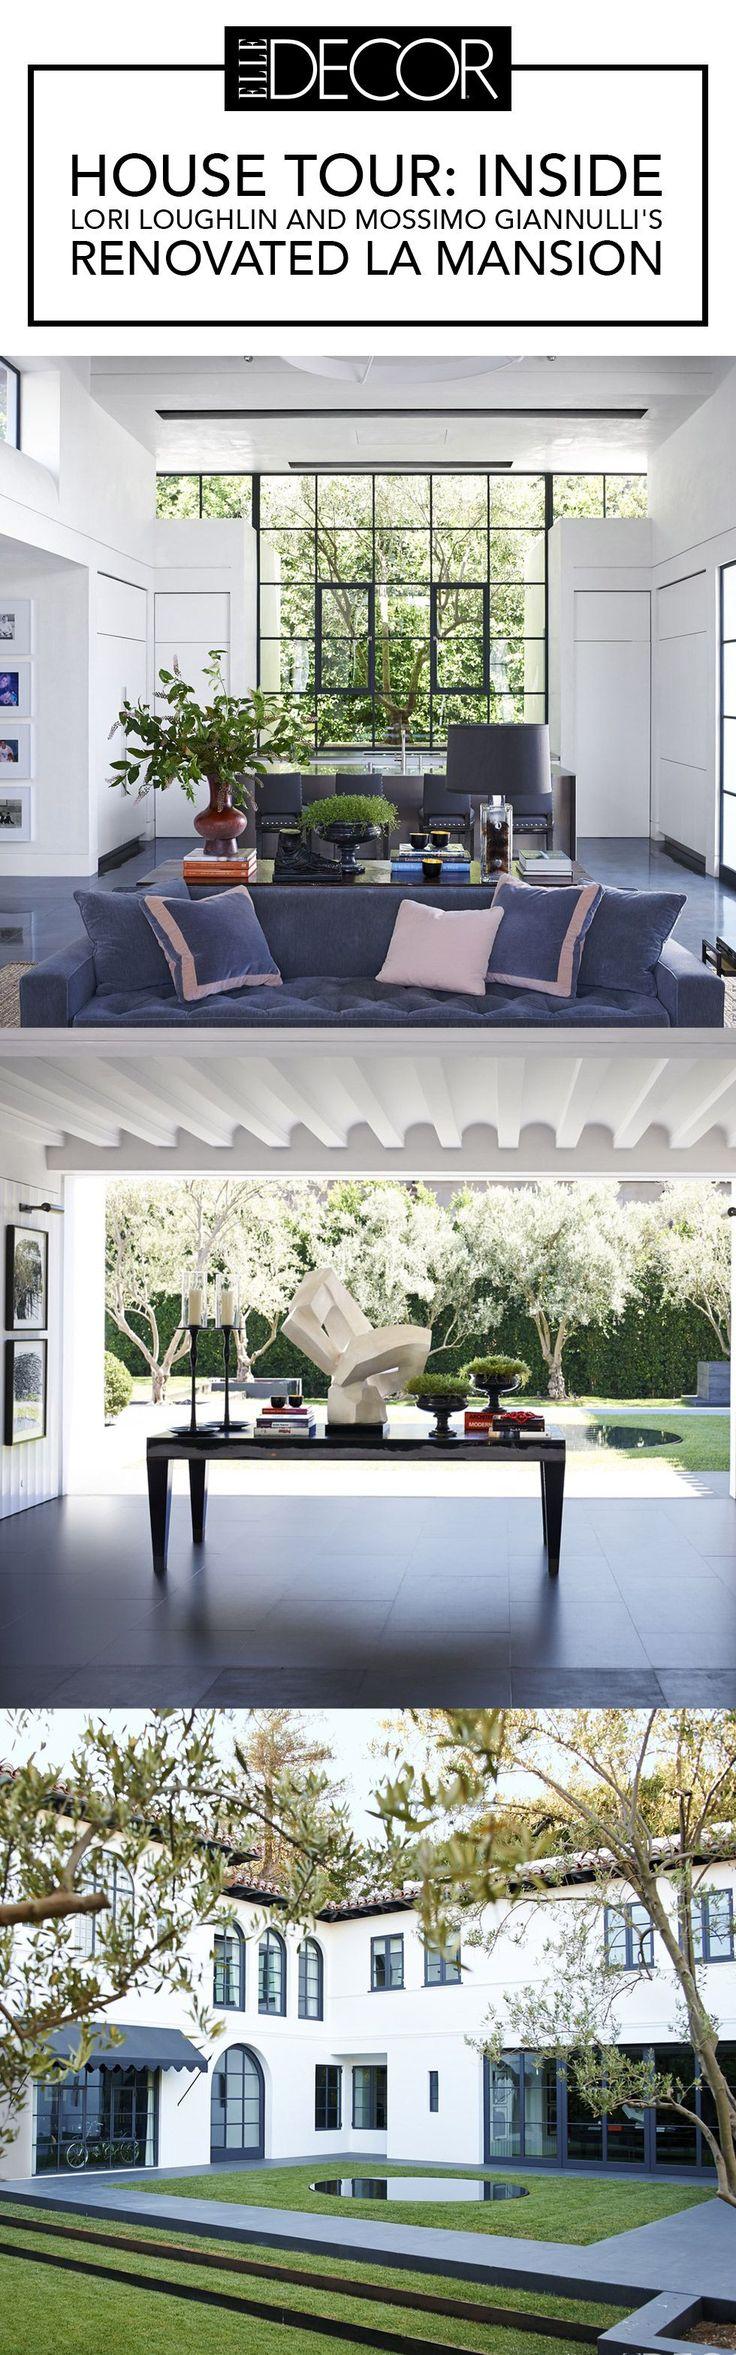 HOUSE TOUR: Inside Lori Loughlin And Mossimo Giannulli's Renovated LA Mansion - ELLEDecor.com